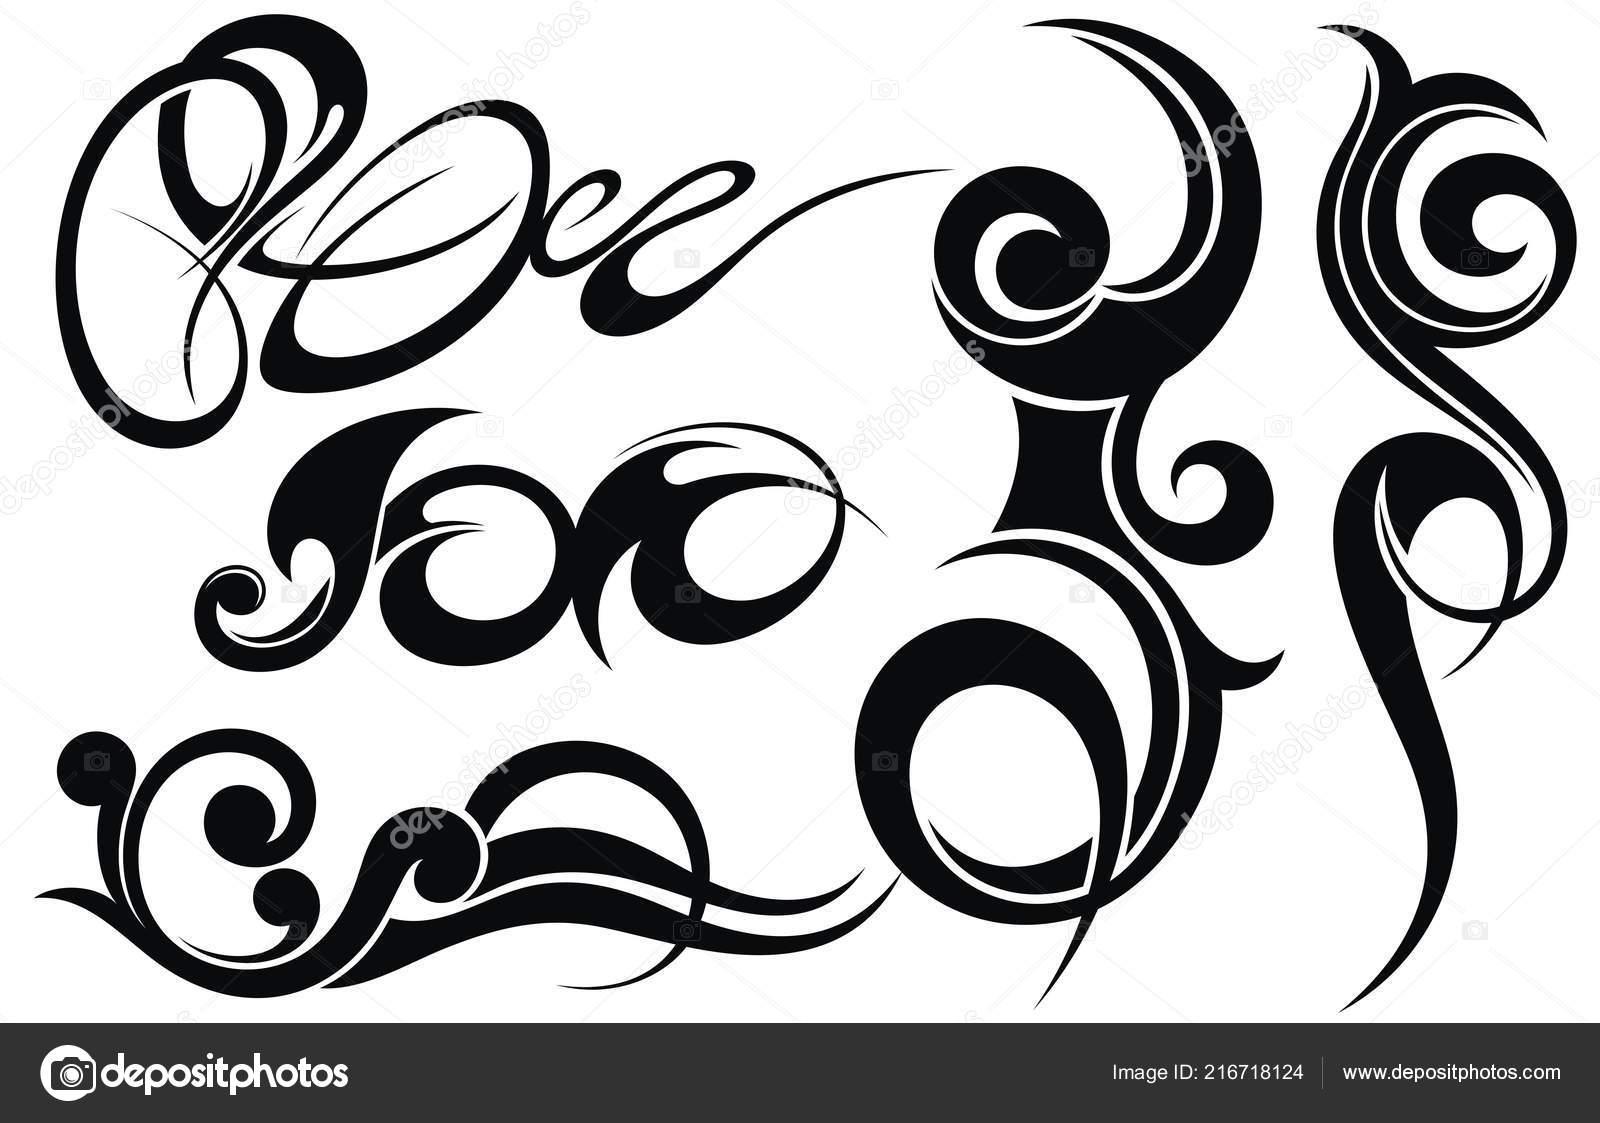 Tribal Tattoo Design Elemente Festlegen Stockvektor C Ksyshakiss